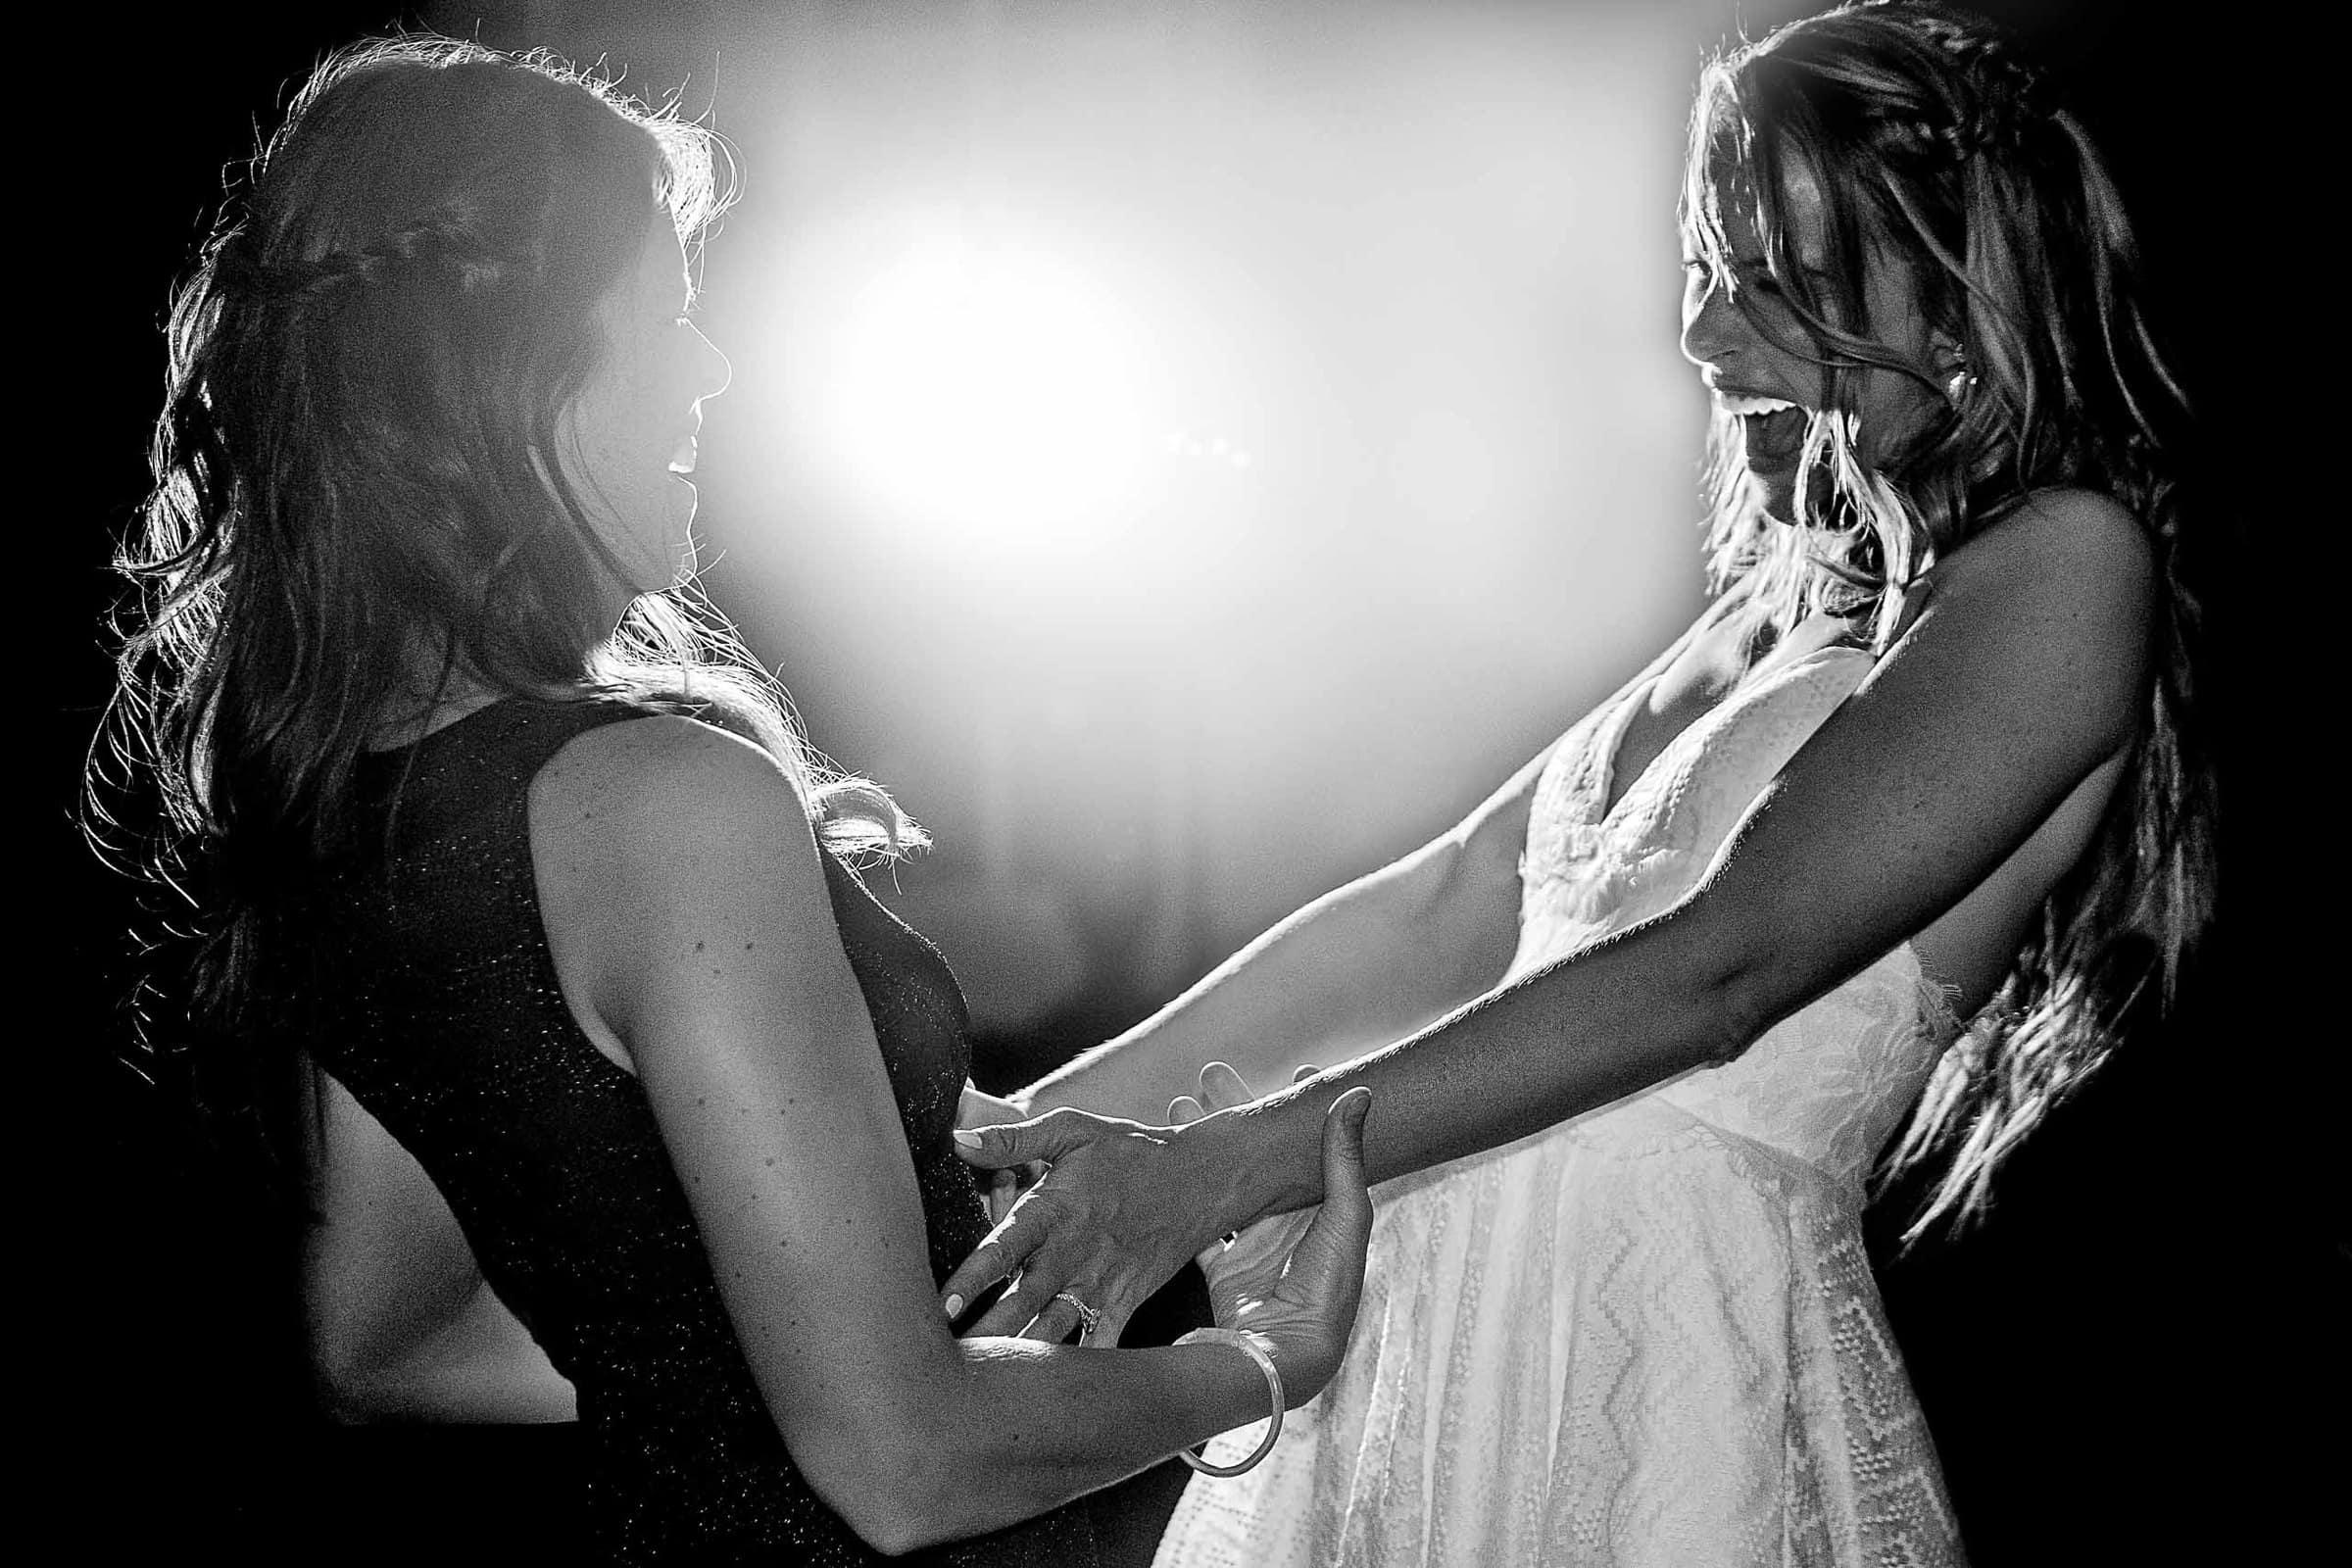 Two happy brides ecstatic dancing during their Calamigos Ranch Wedding in Malibu, California